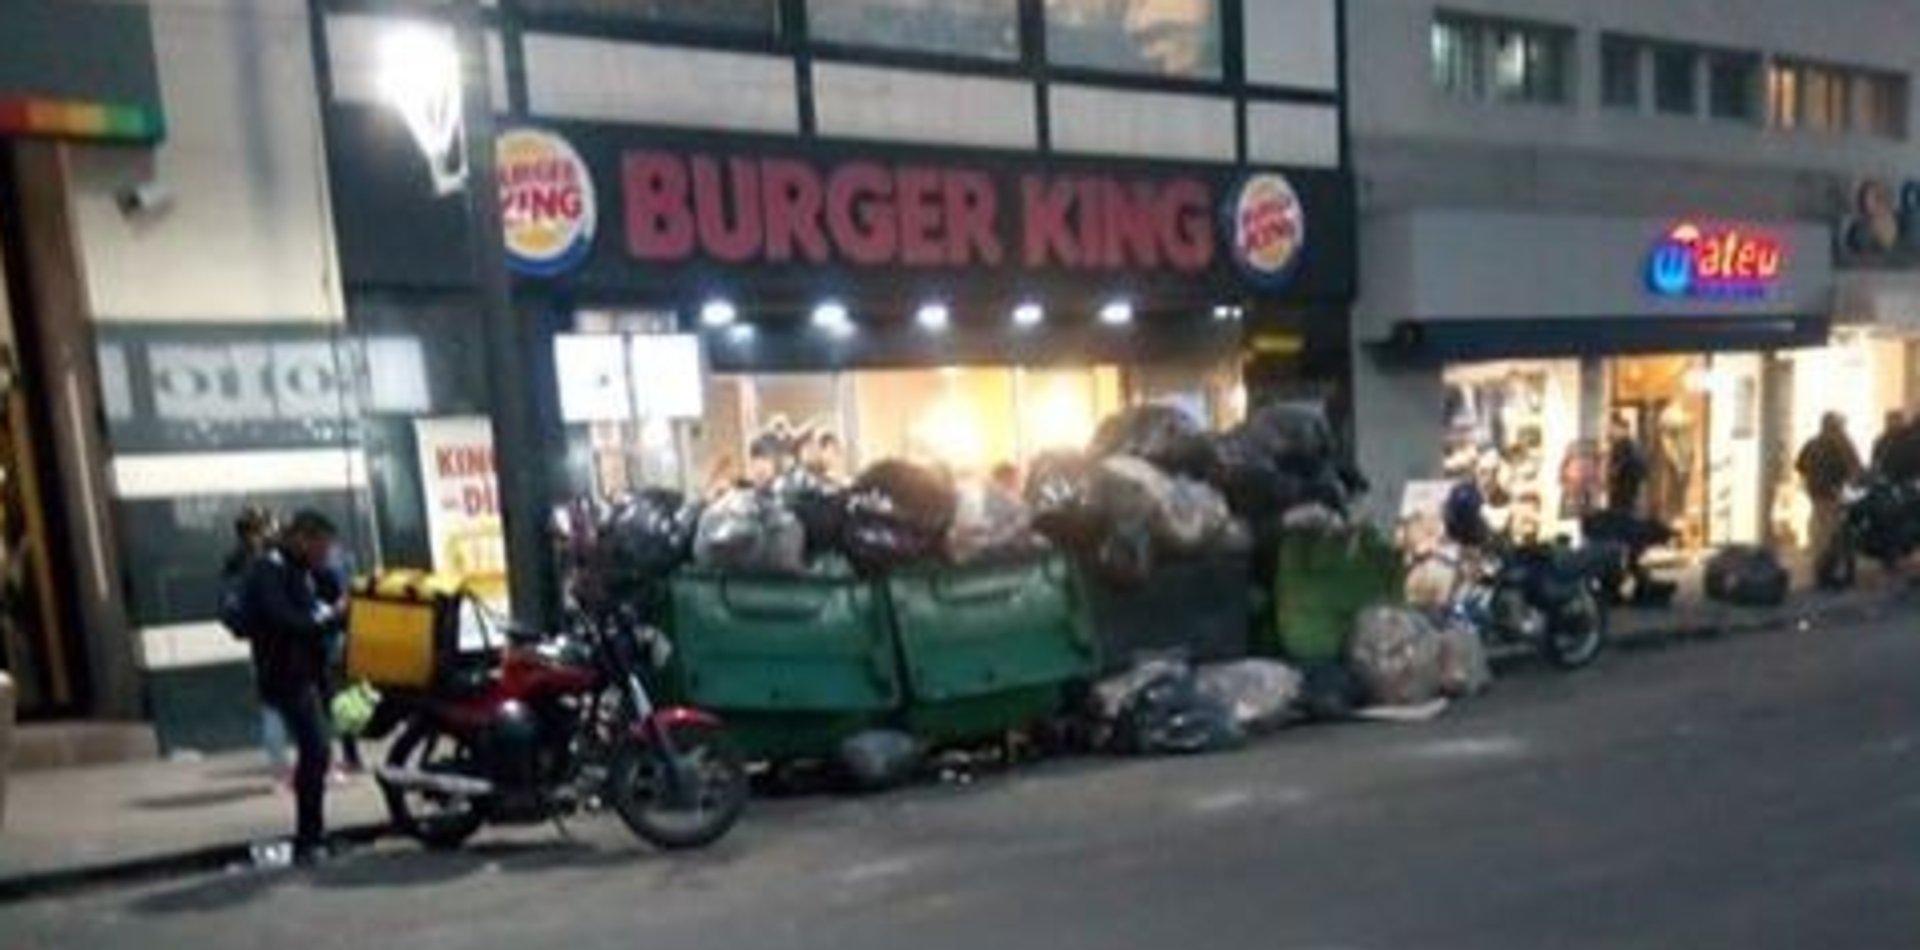 Denunció que Burger King llenó de basura la calle y le cerraron la cuenta de Twitter